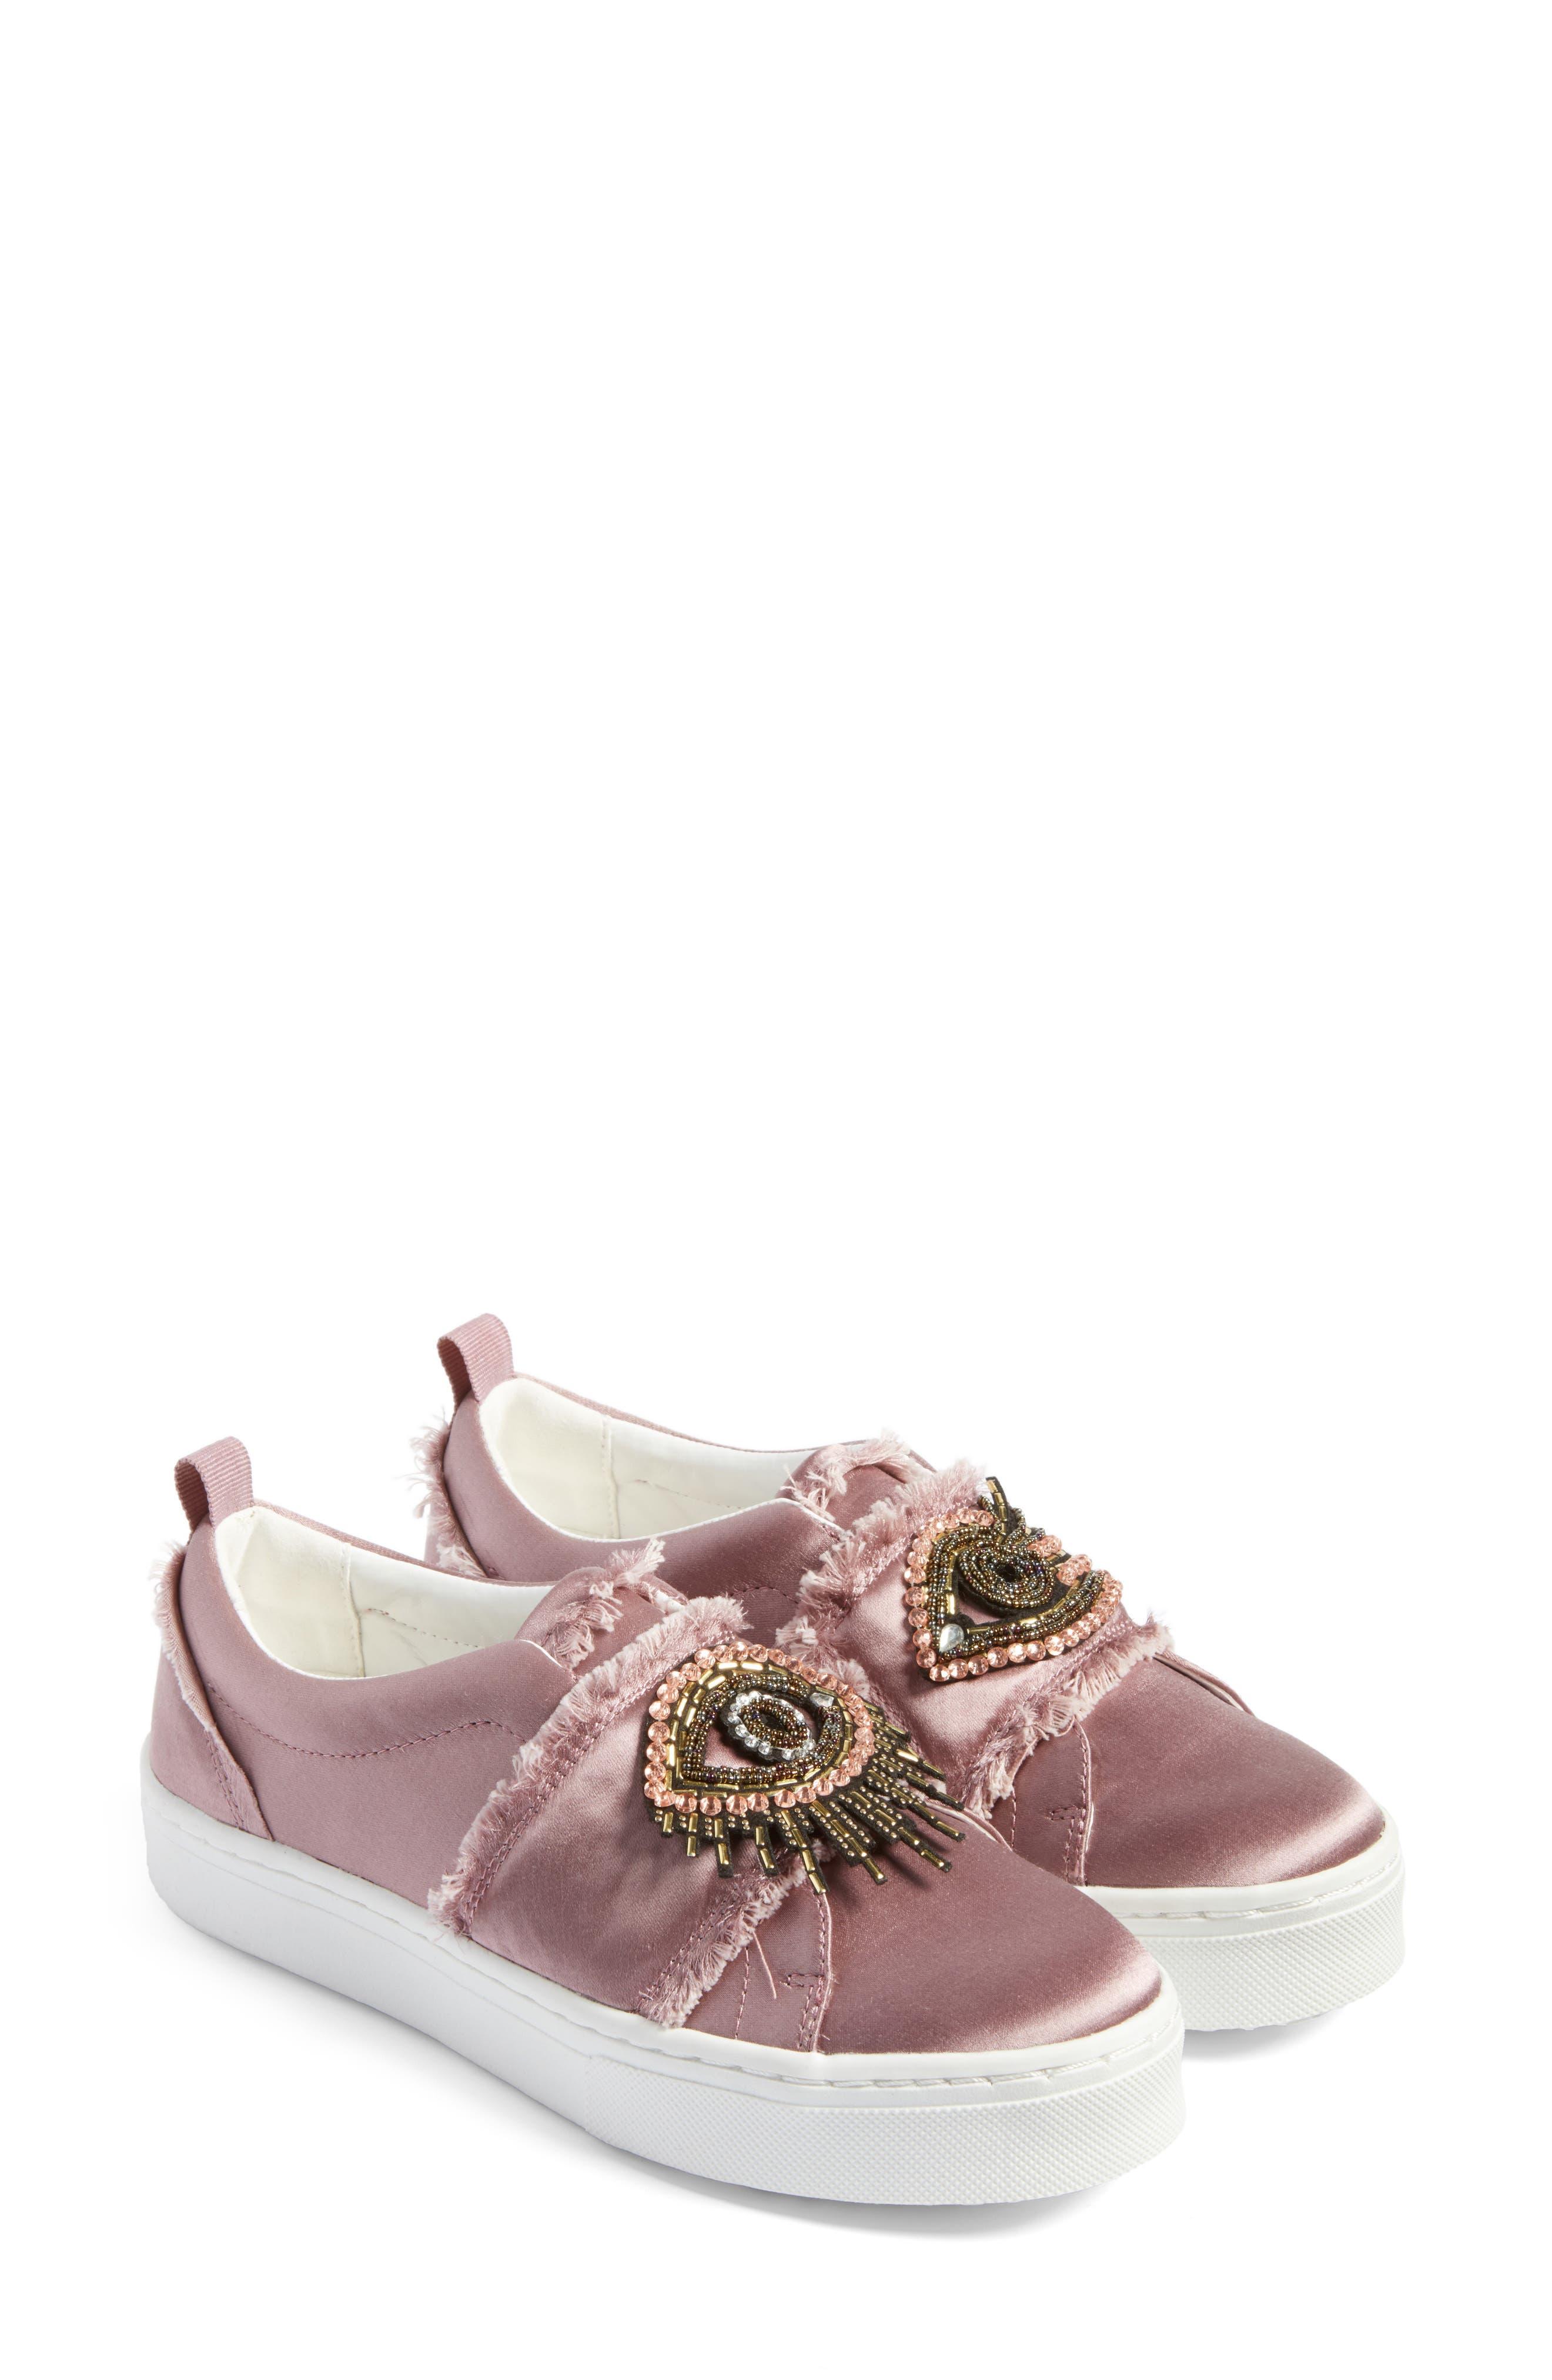 Levine Sneaker,                             Main thumbnail 1, color,                             Pearl Pink Satin